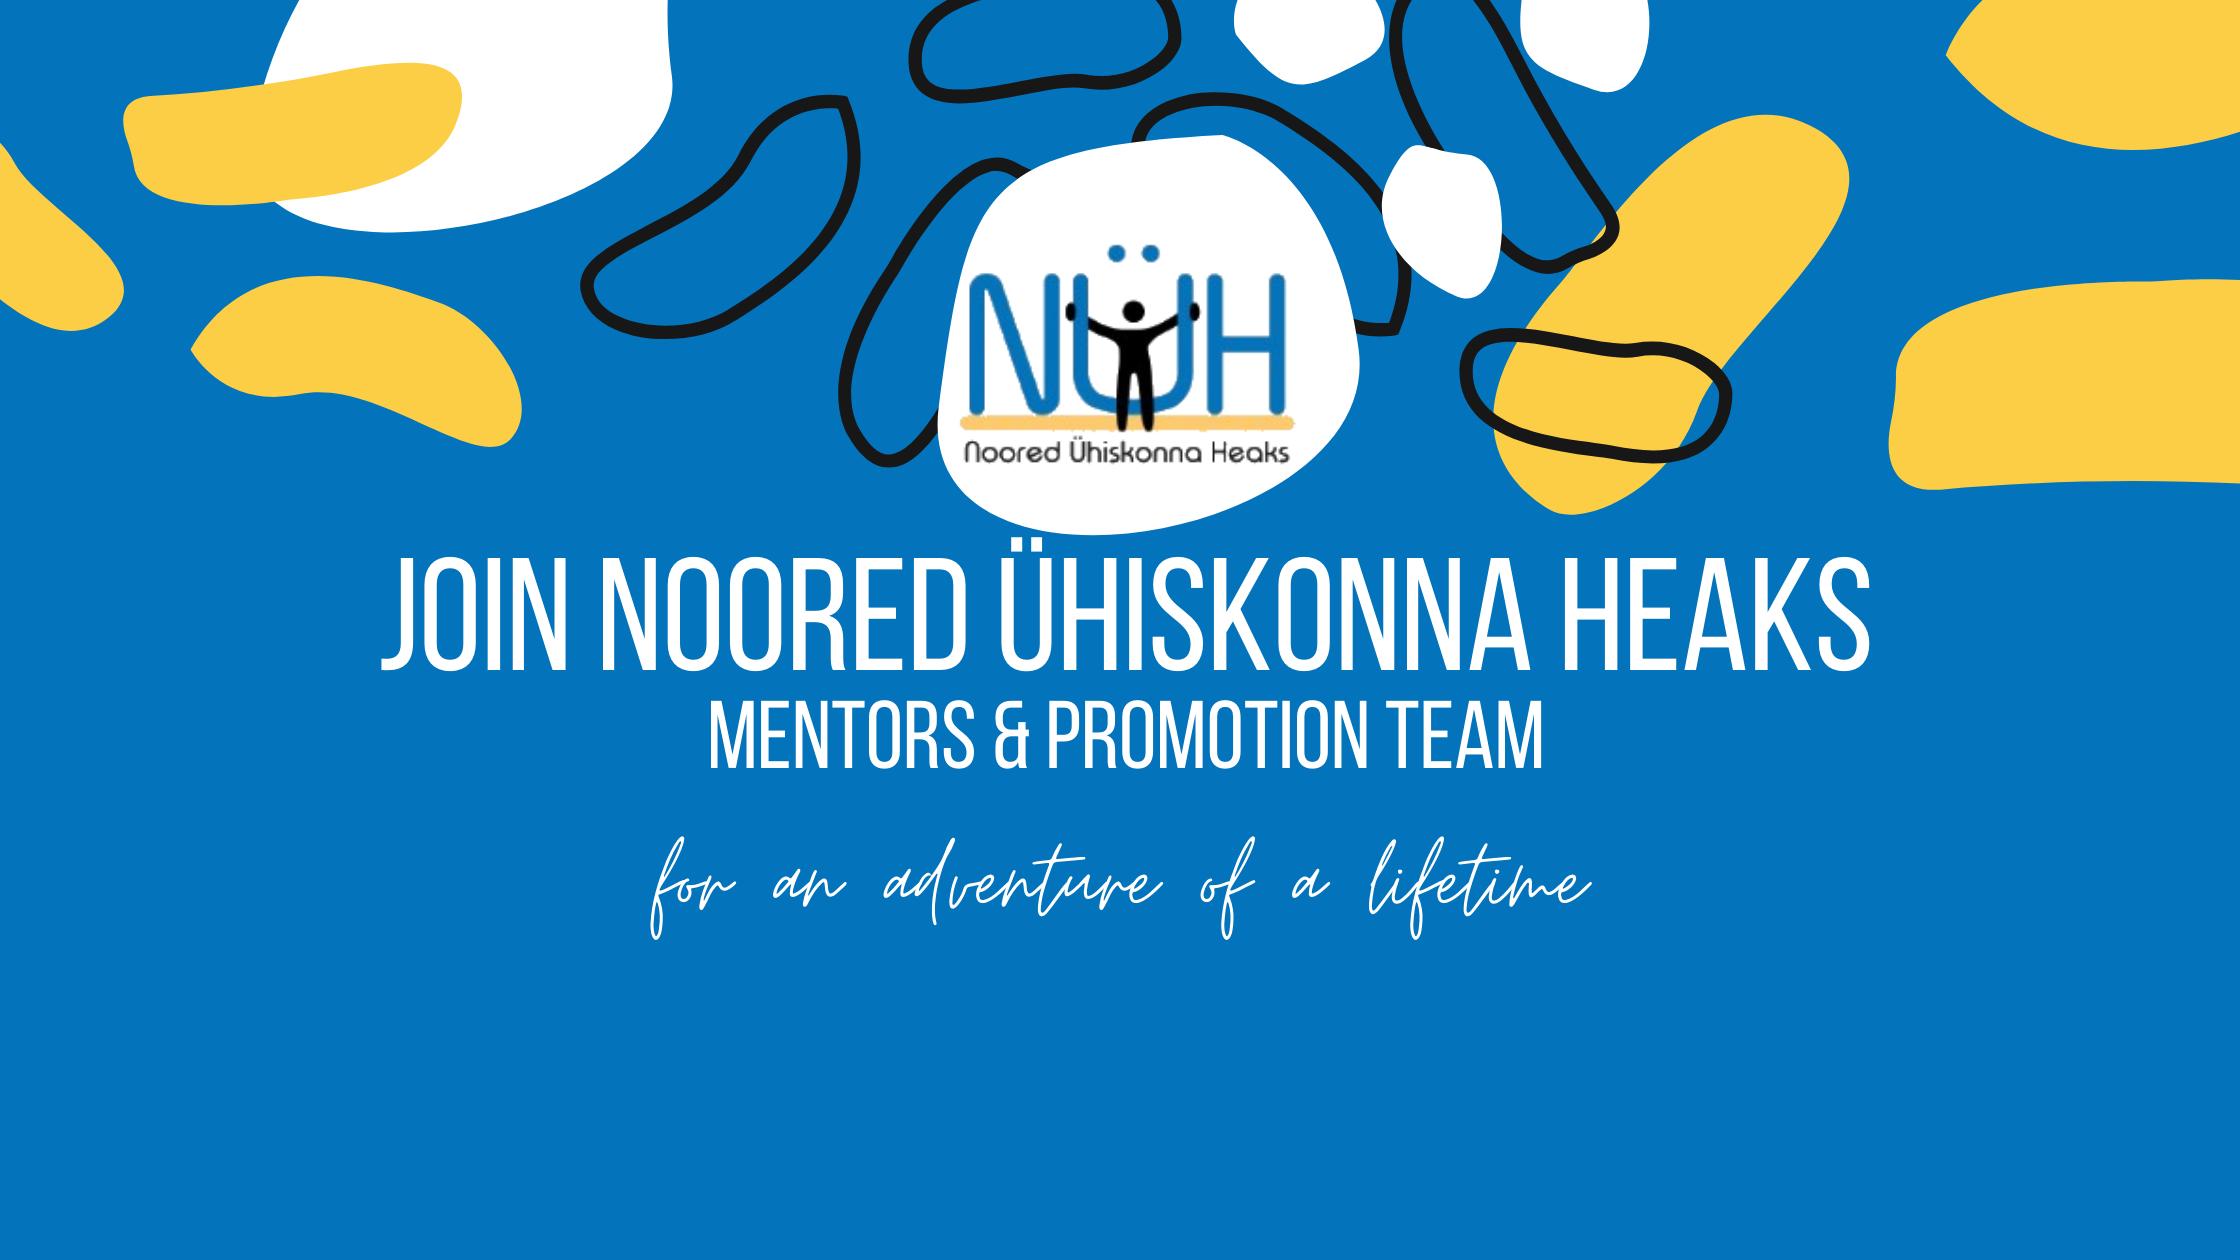 nyh summer days promotion mentors volunteers eesti estonia